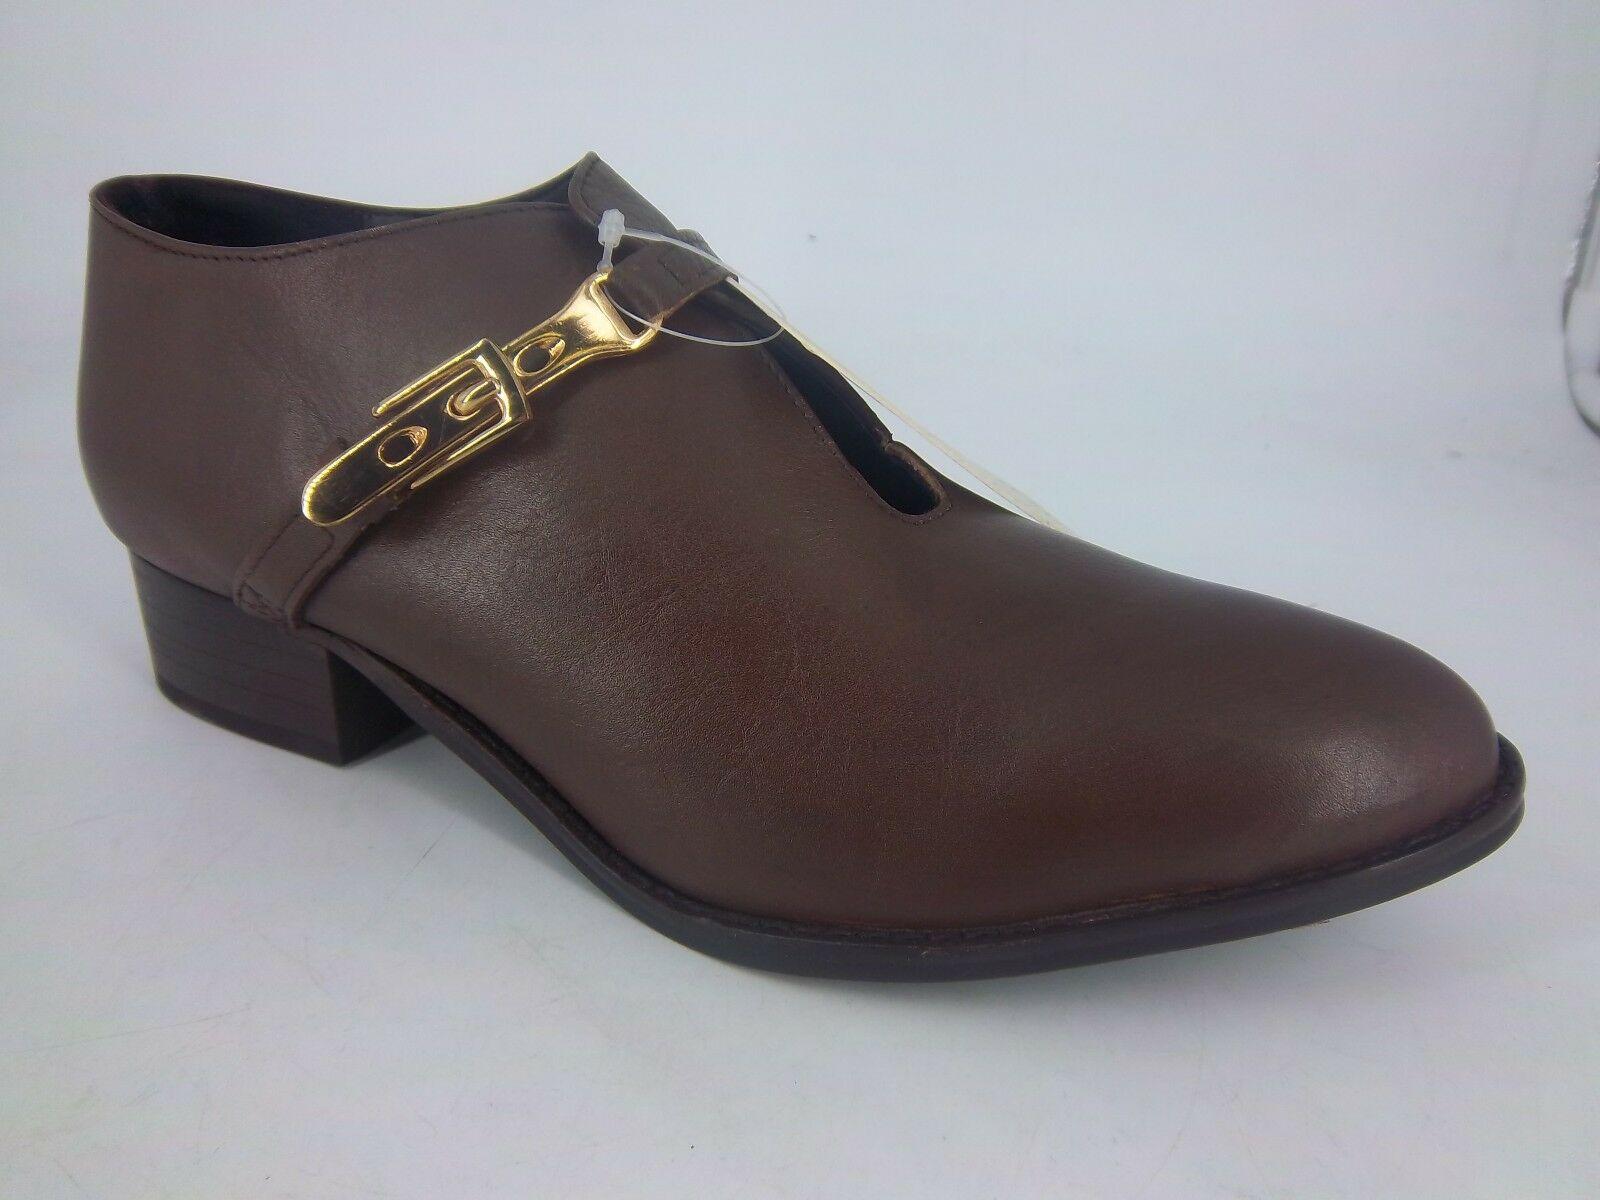 Park Lane Strap Leather Shoe Boots Brown